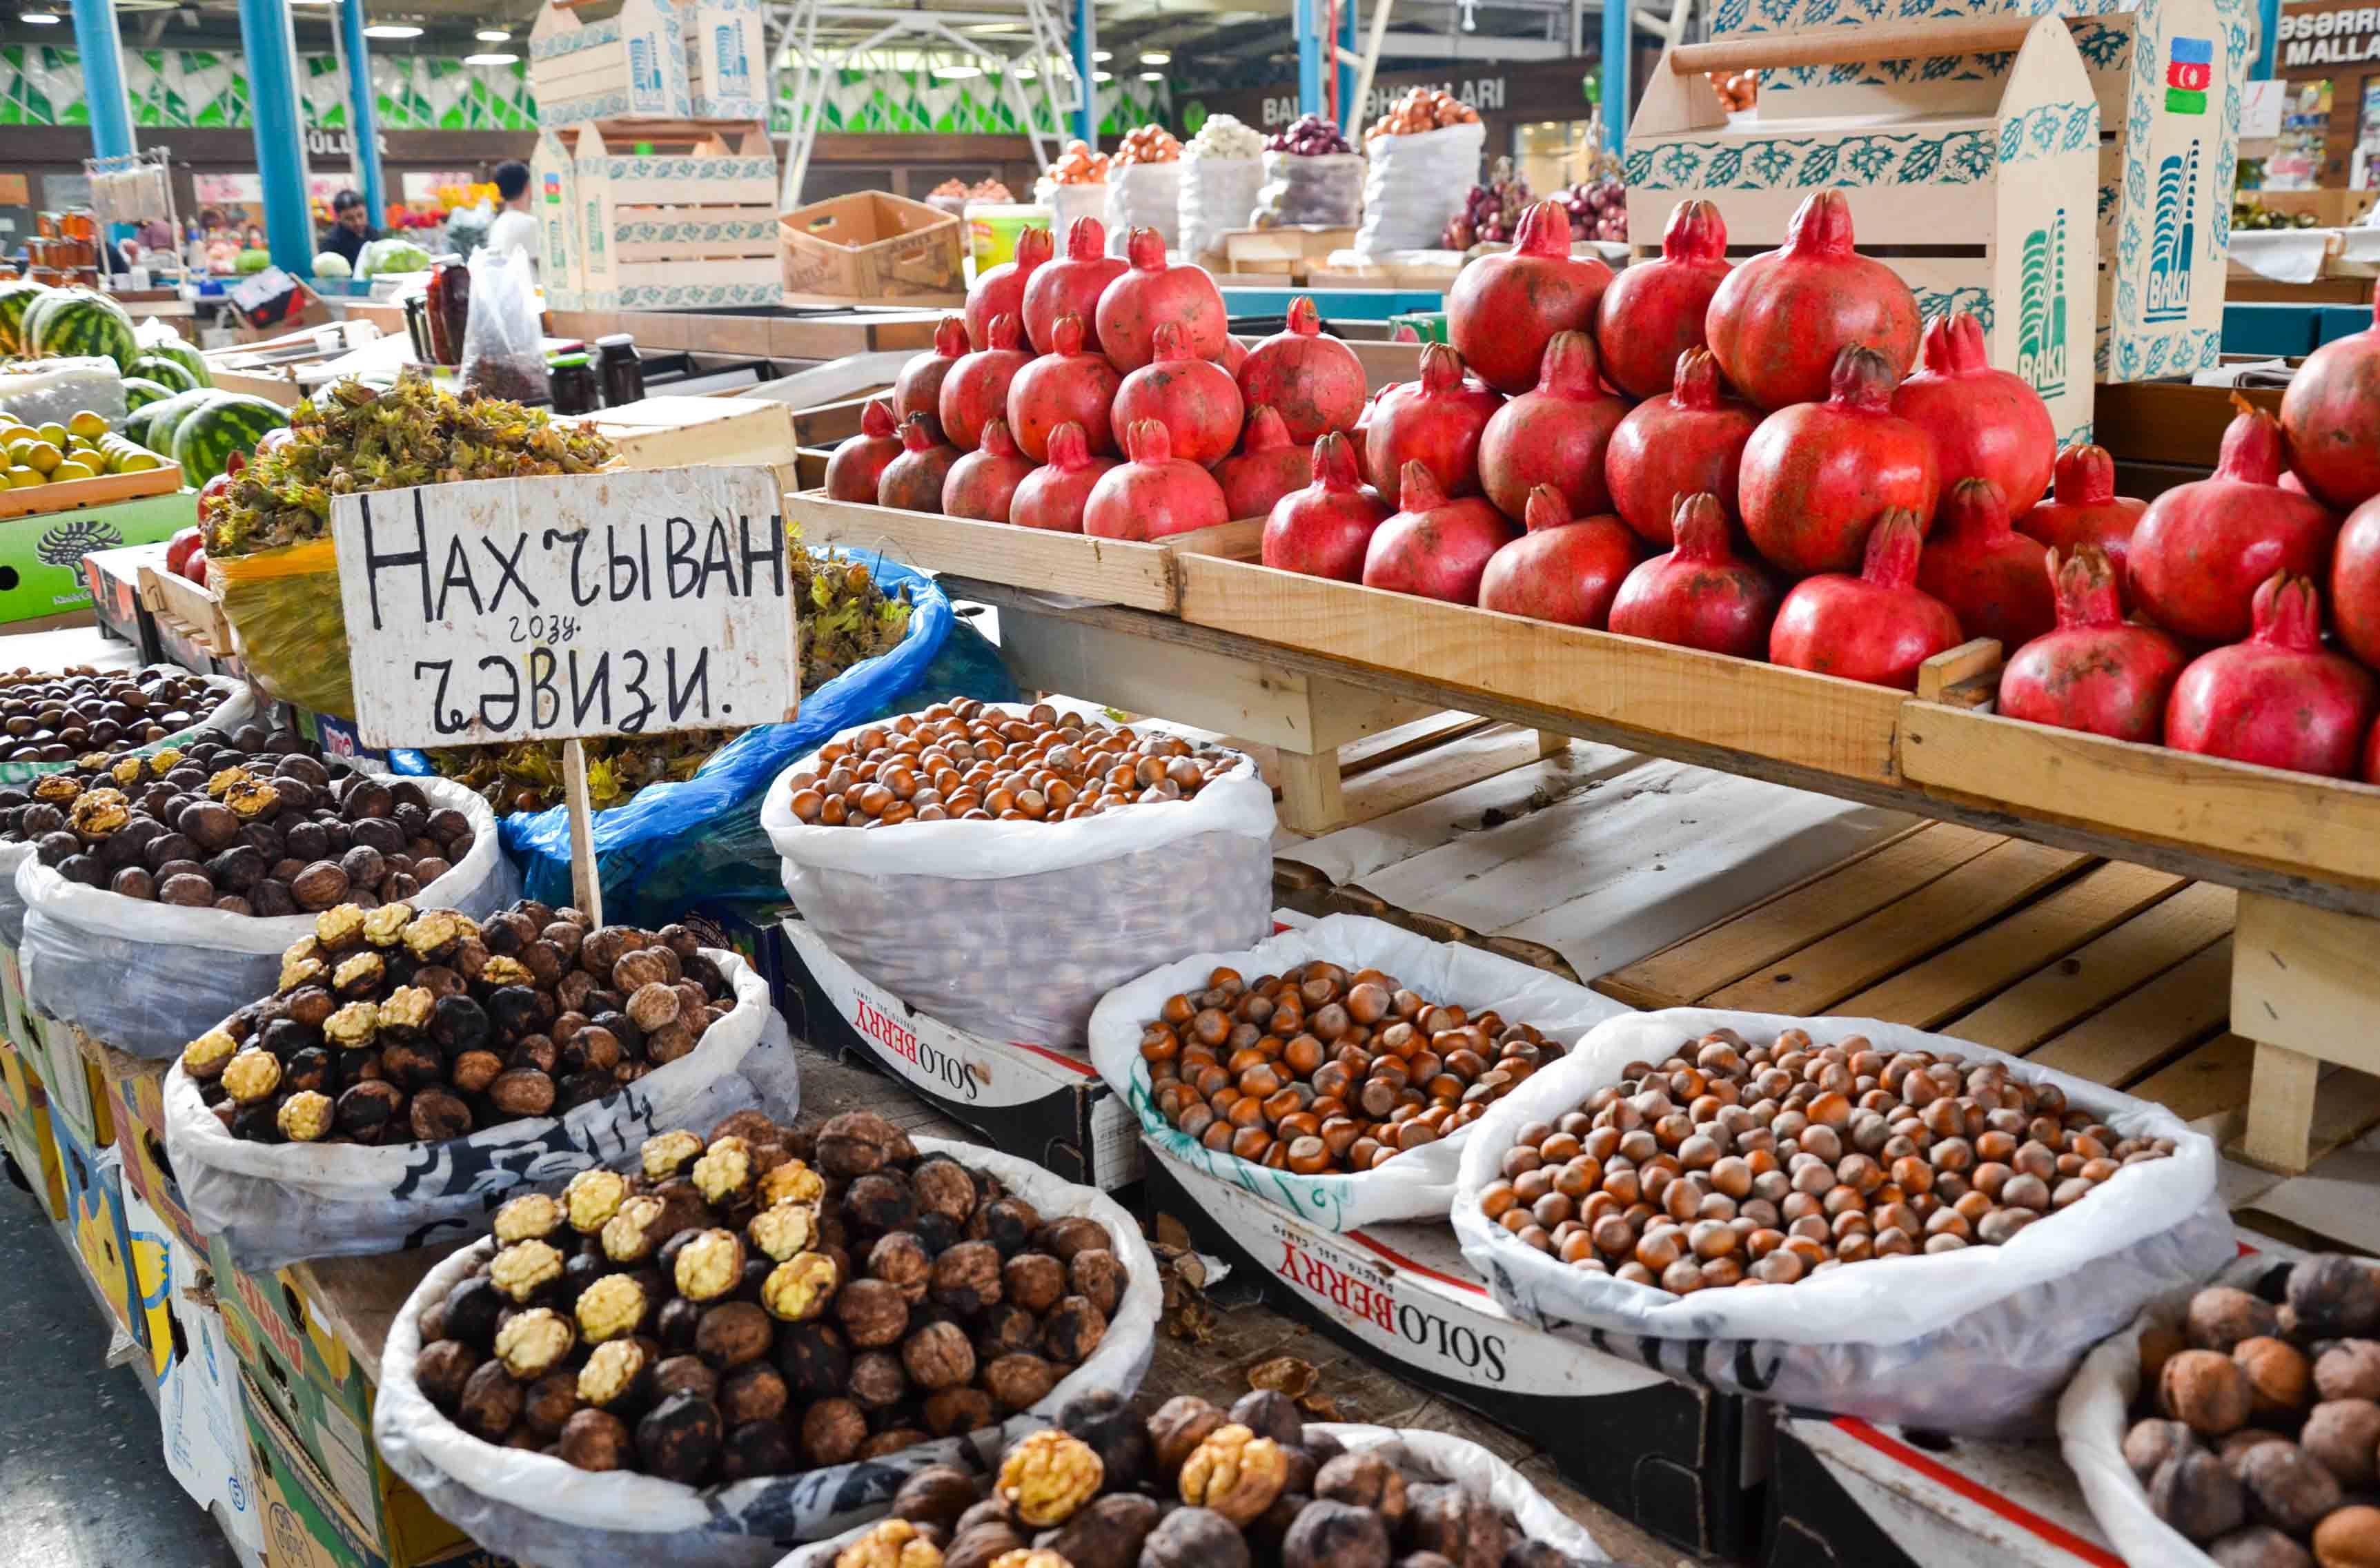 Яшыл базар в Баку или что привезти из Азербайджана